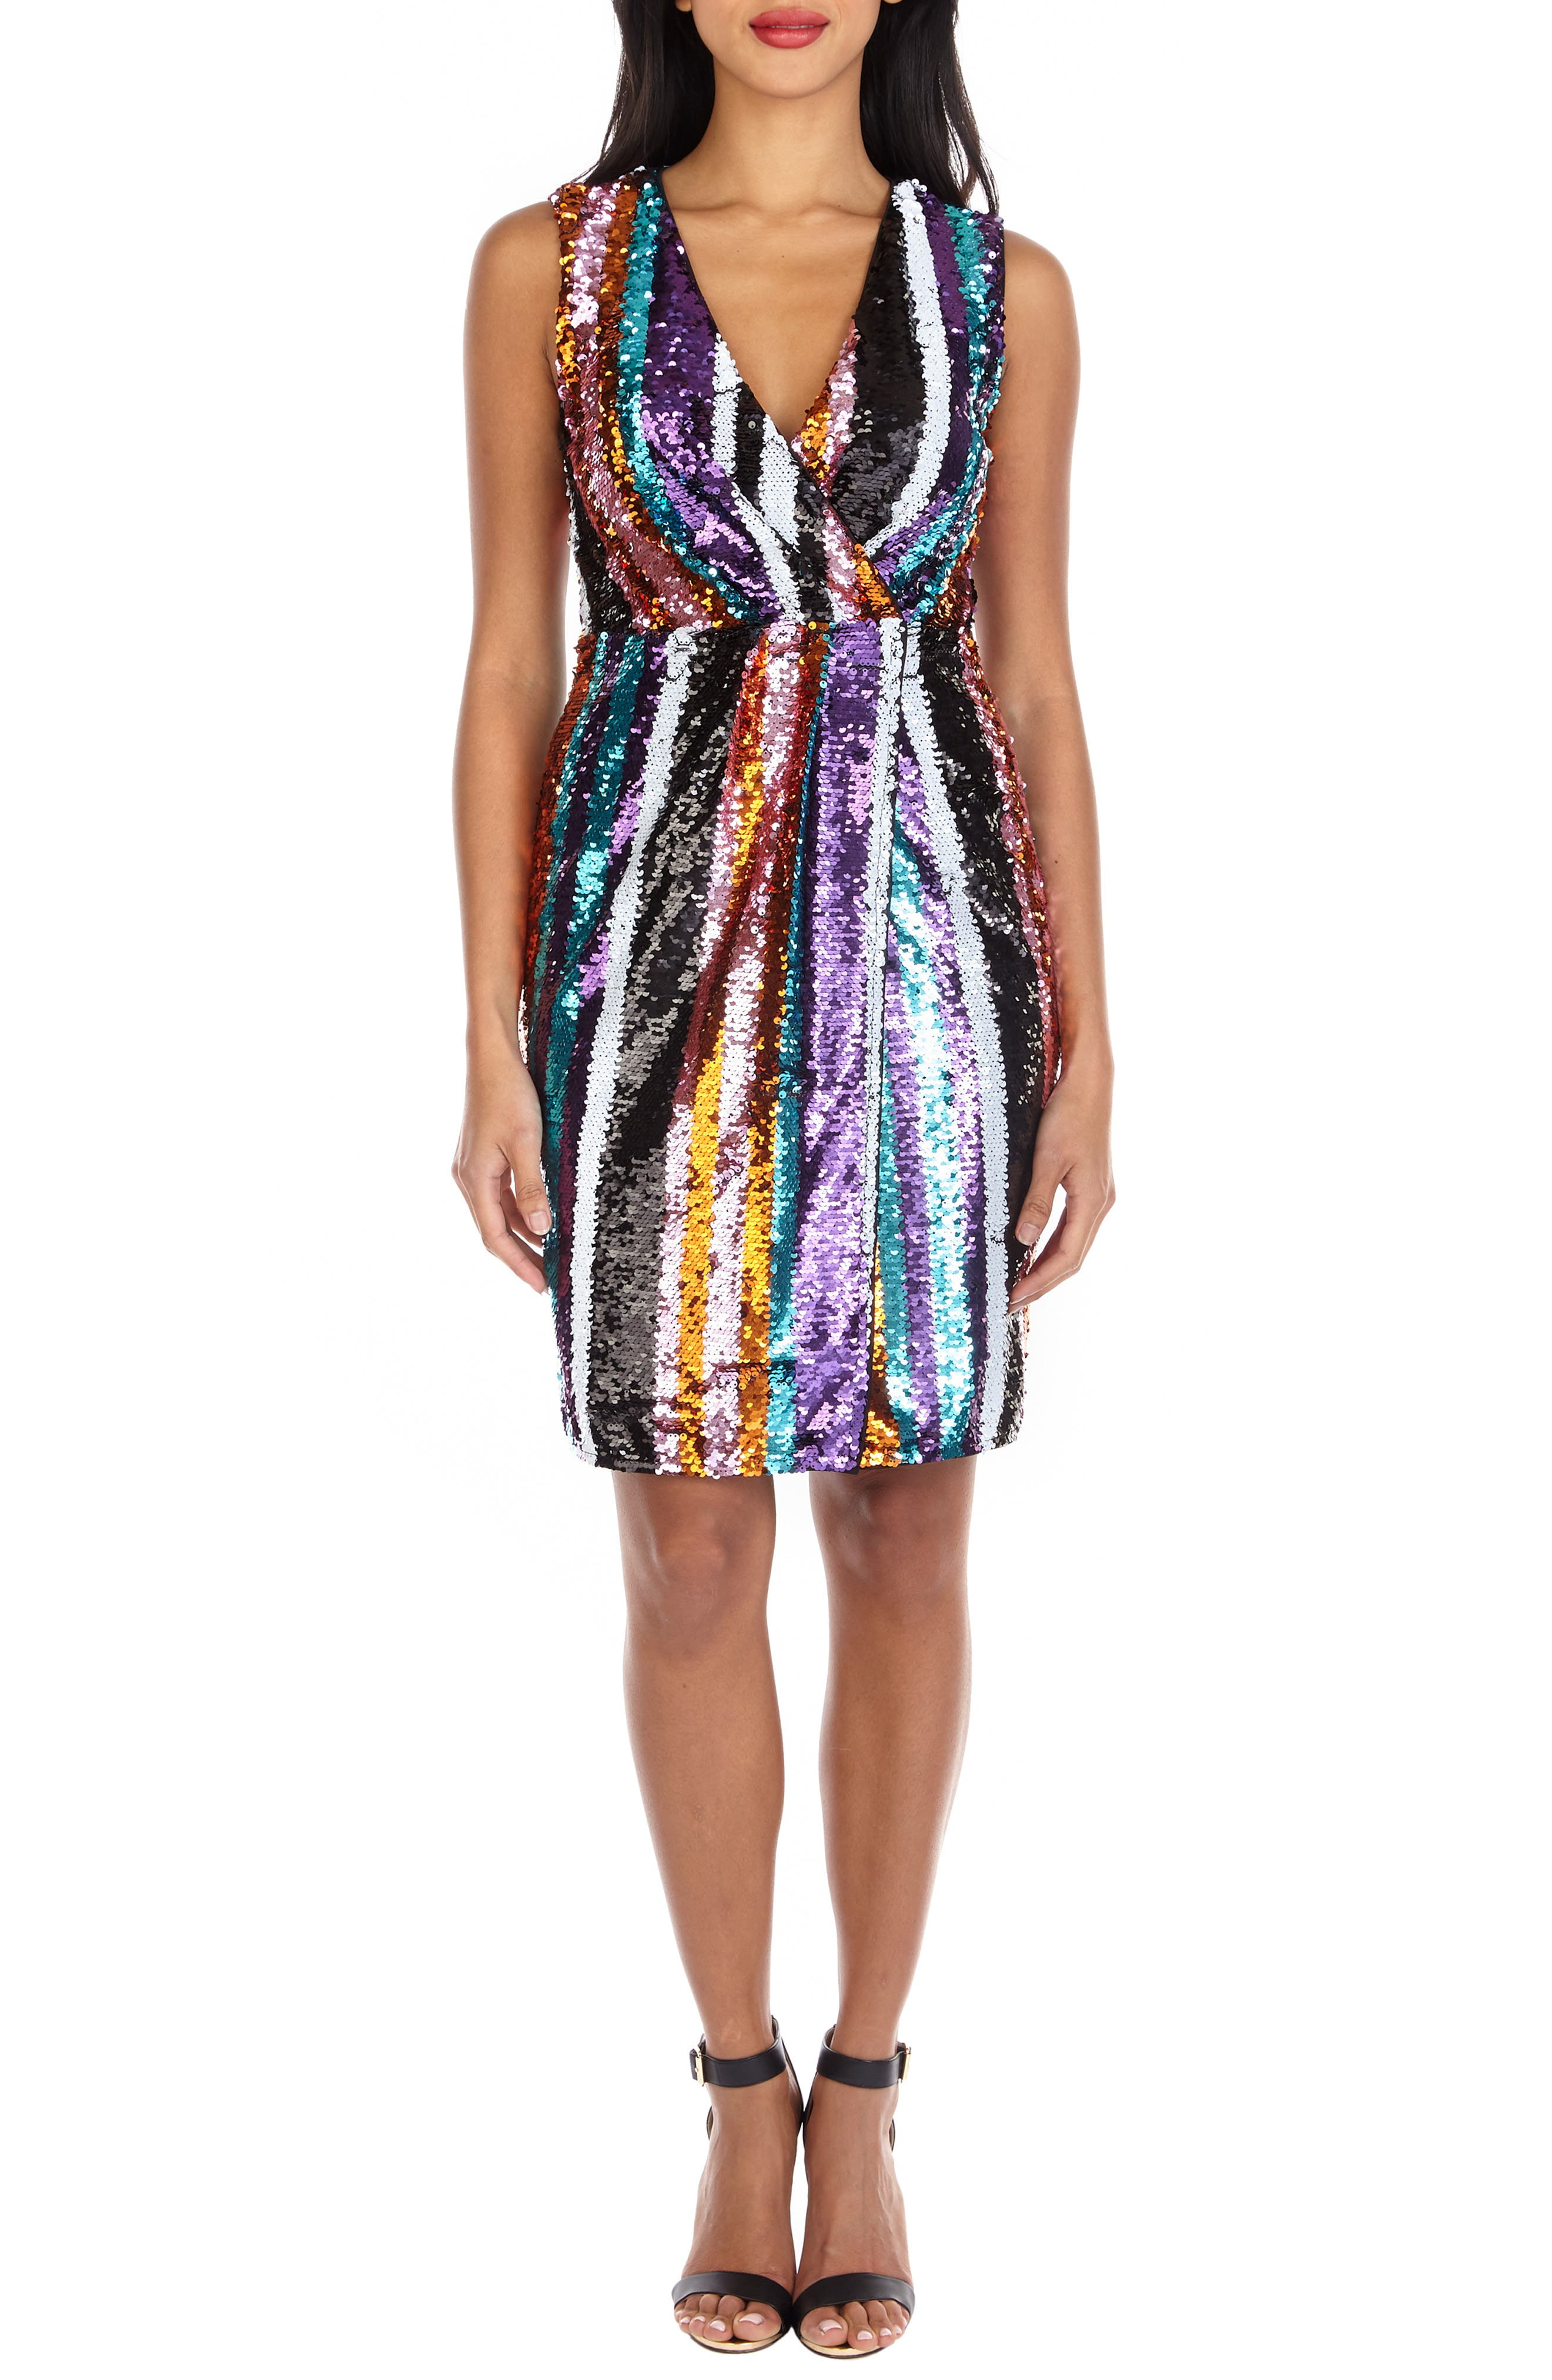 Sarah Rainbow Sequin Stripe Cocktail Sheath,                             Alternate thumbnail 4, color,                             MULTI PURPLE